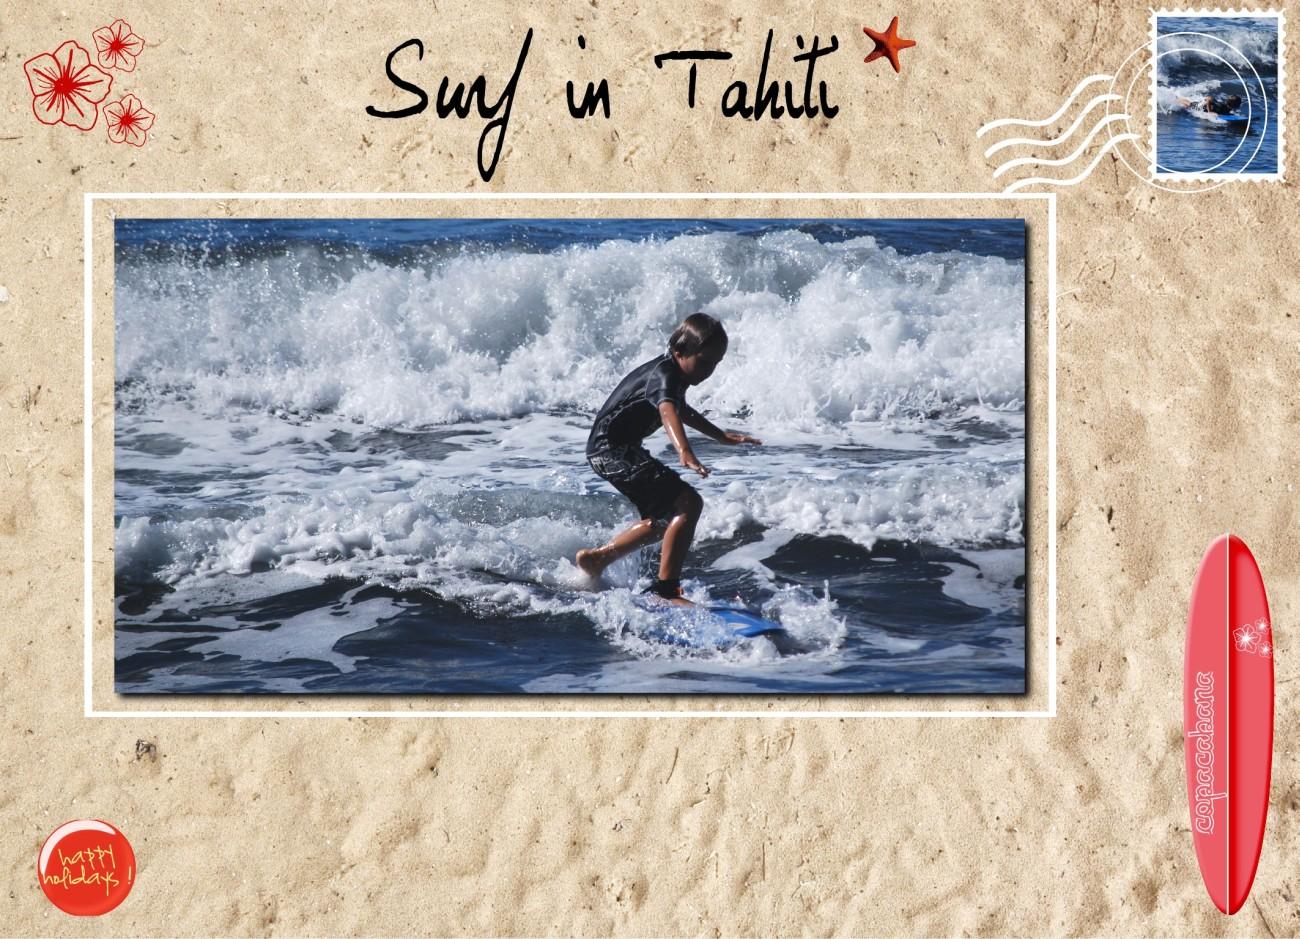 Surf in Tahiti...